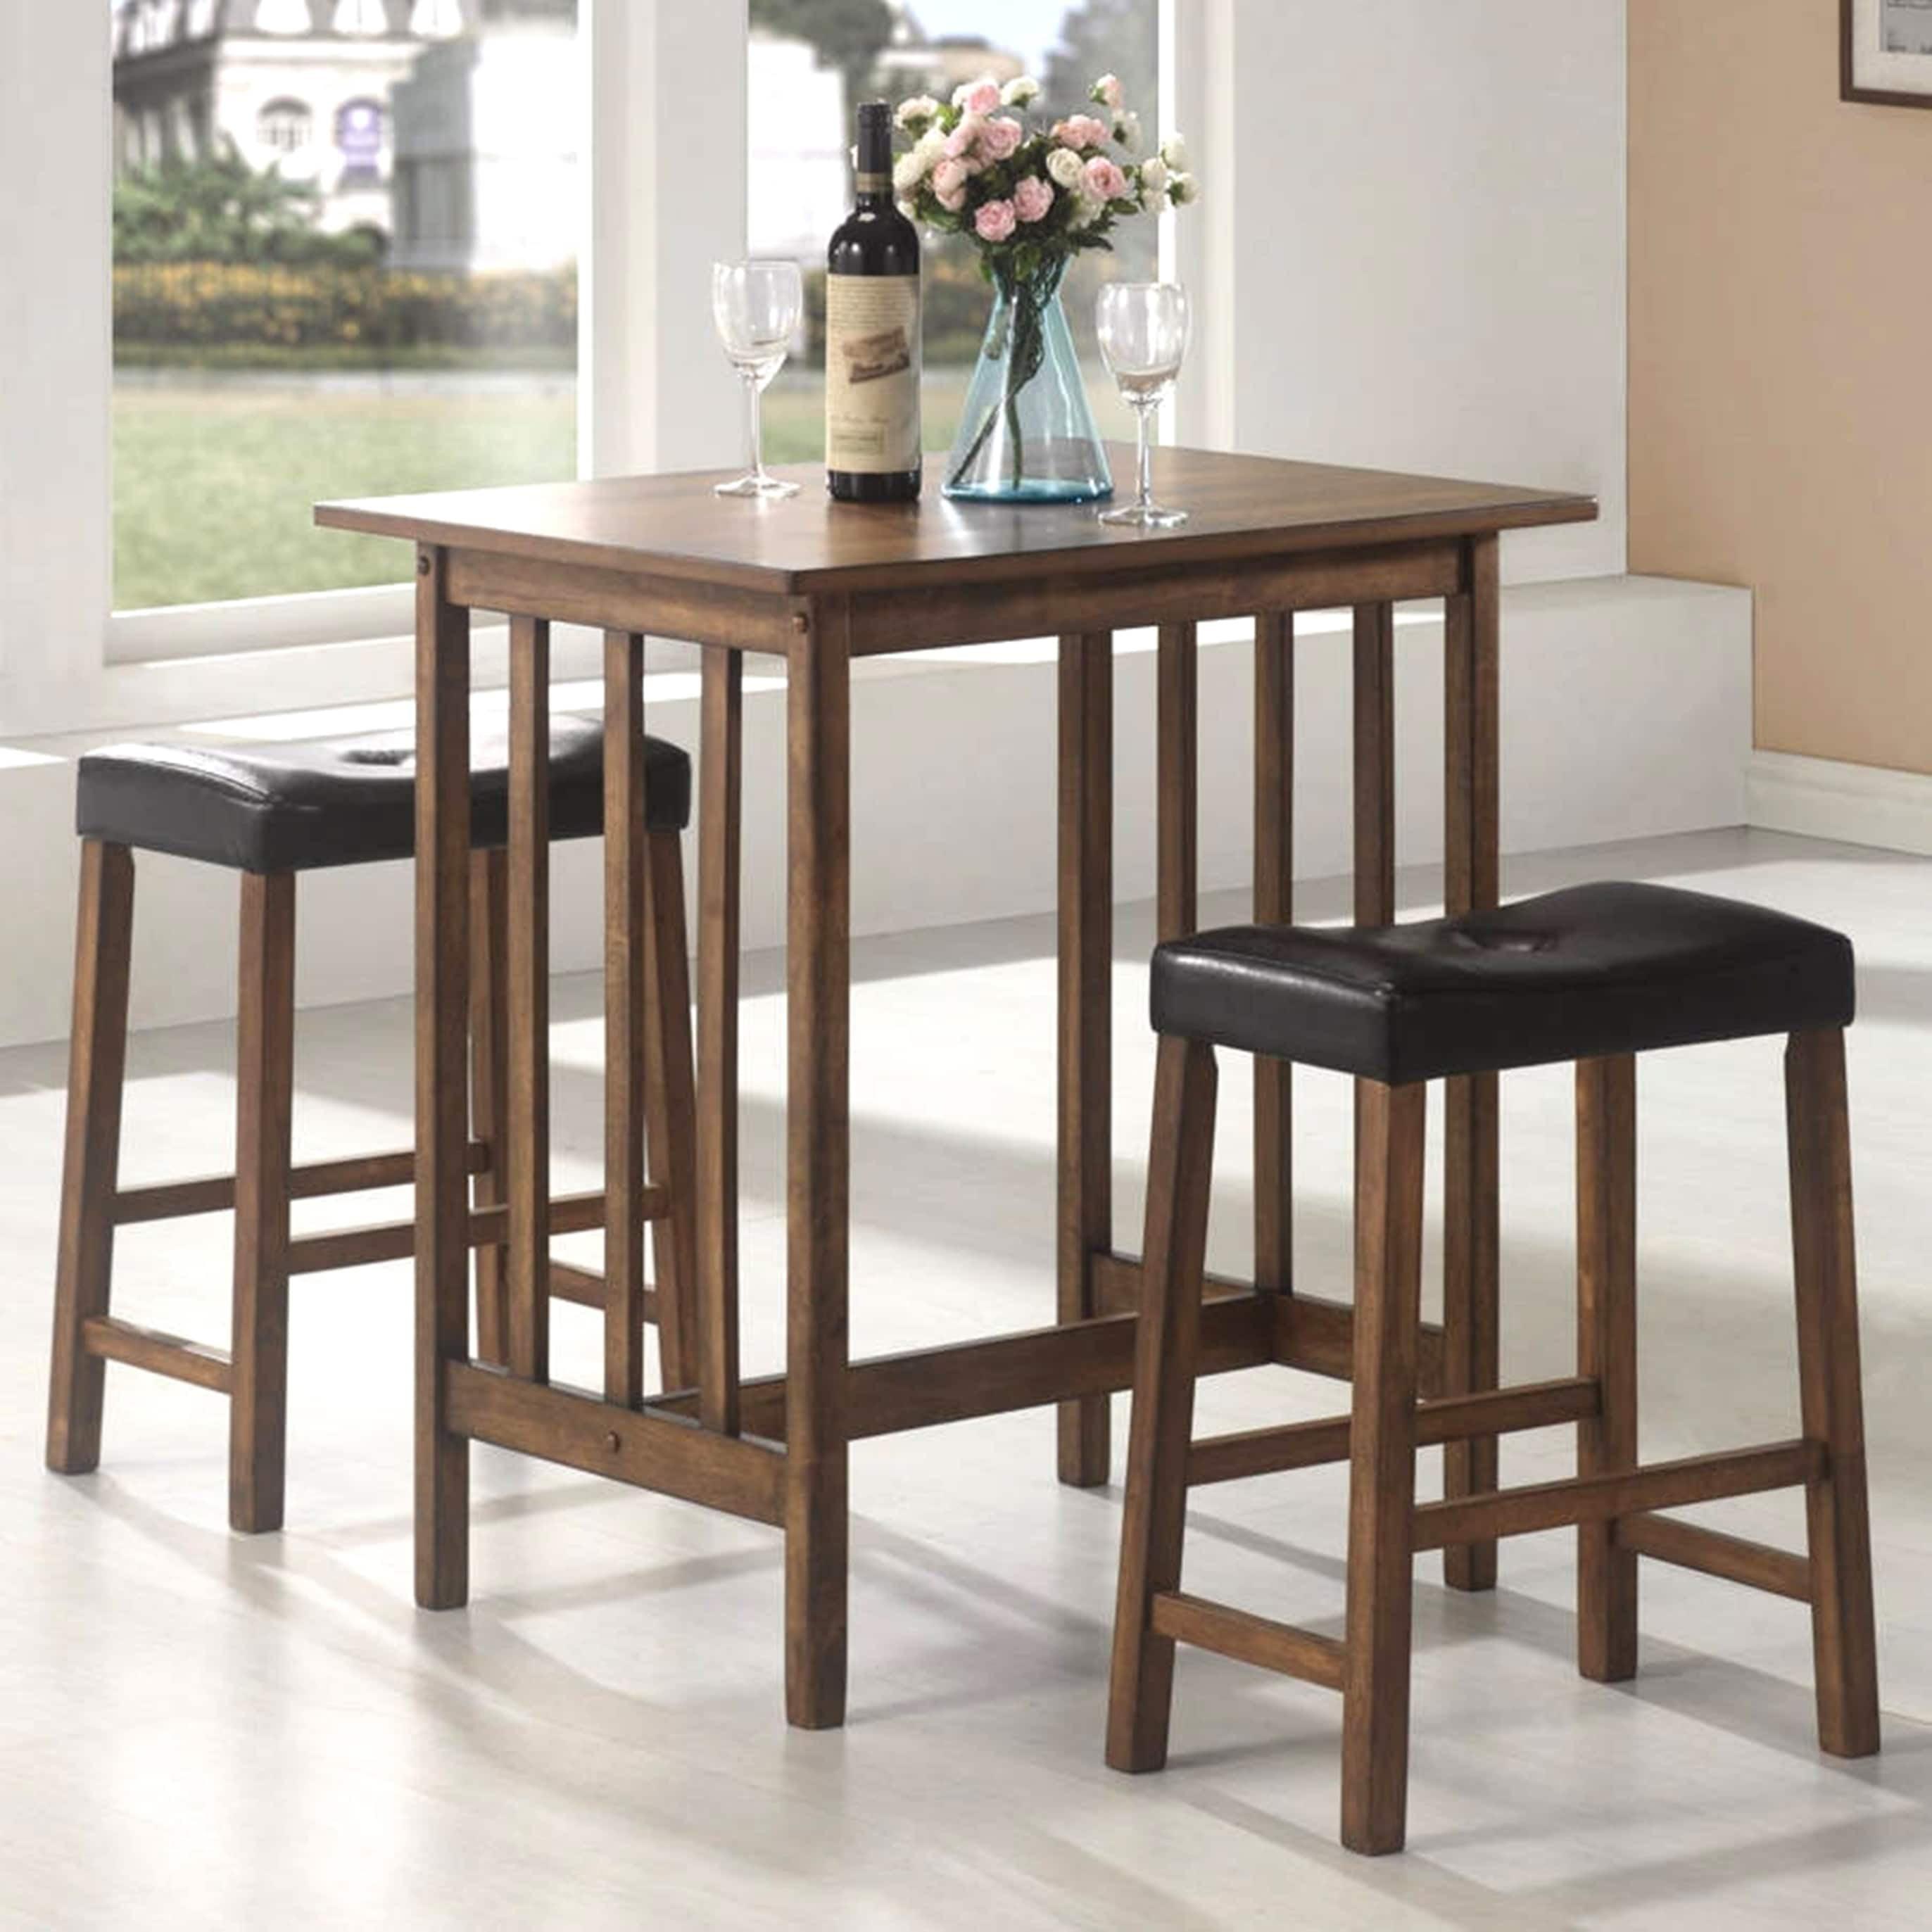 A Line Furniture Mid Century Design 3-piece Counter Height Pub Set